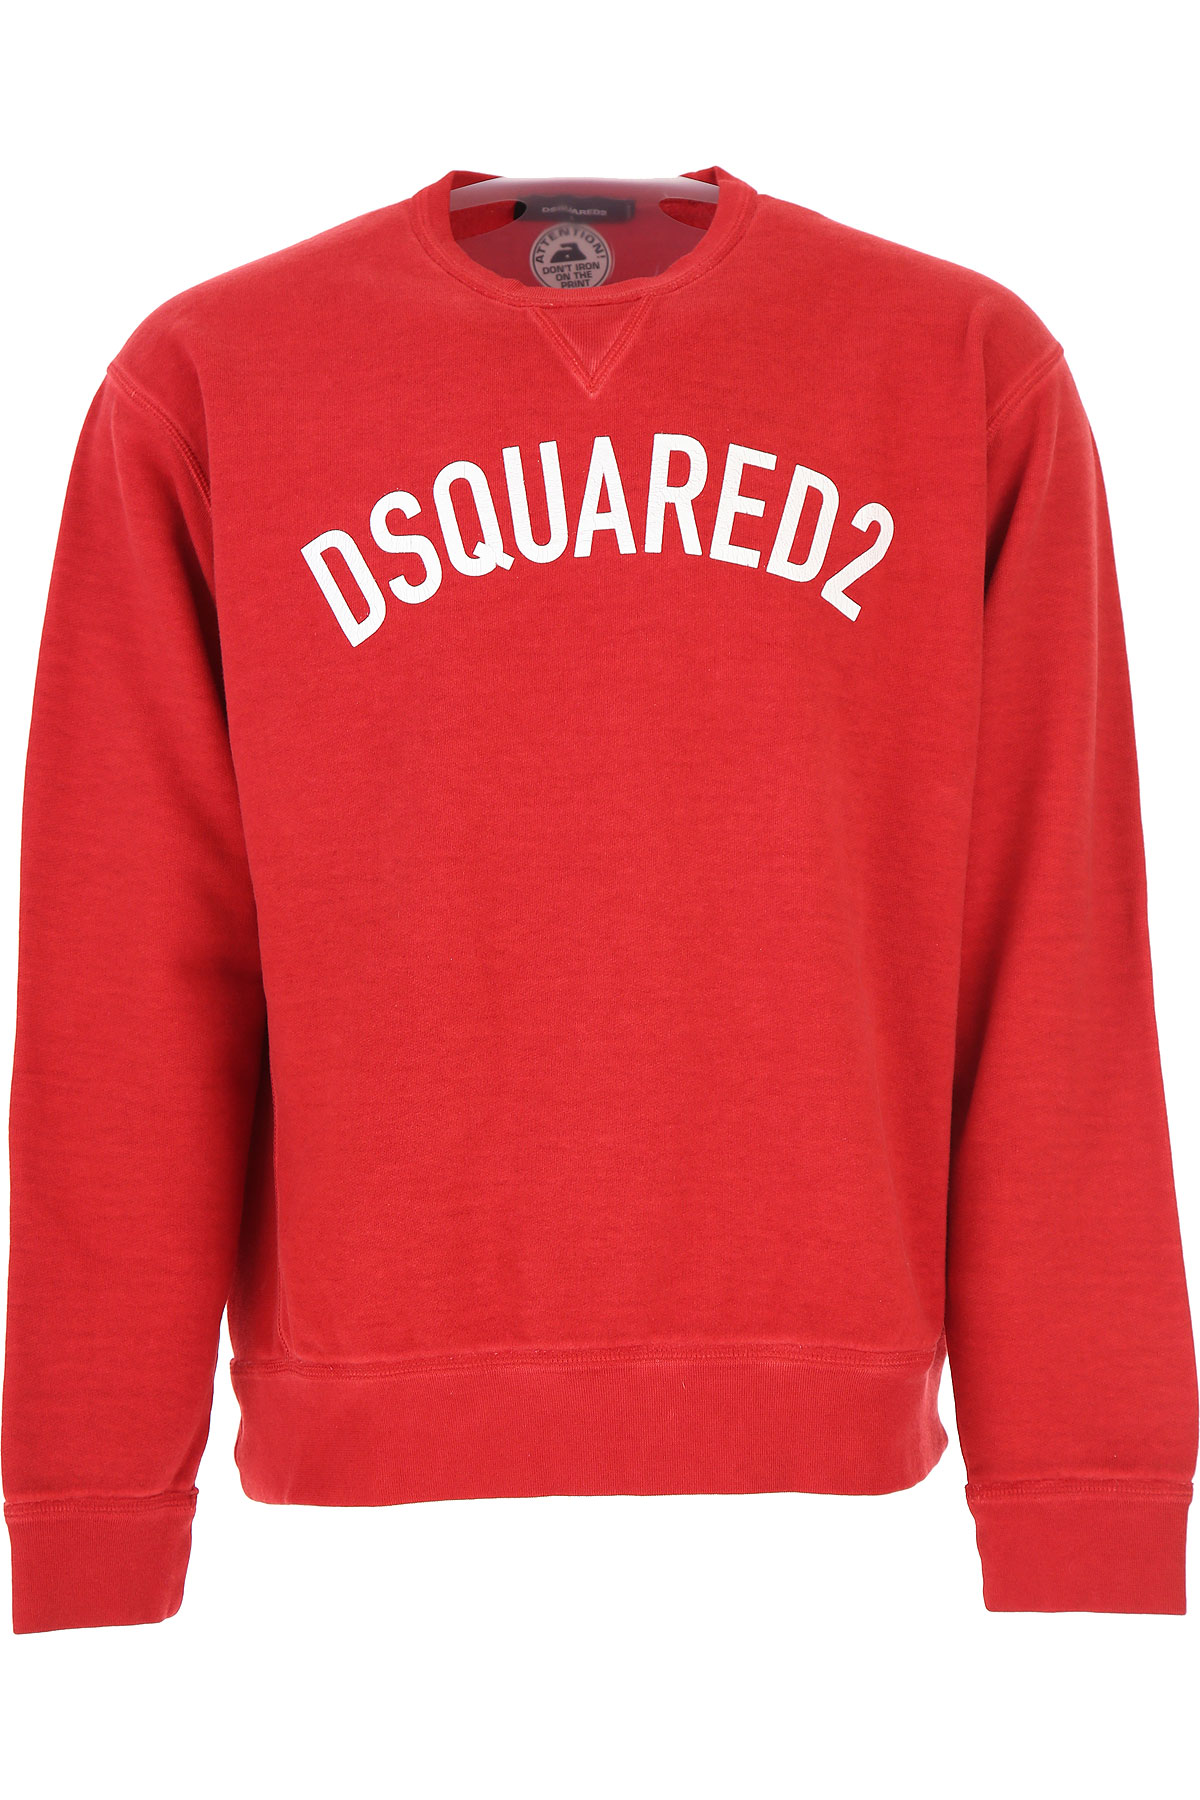 Dsquared2 Sweatshirt for Men, Red, Cotton, 2017, L XL USA-479924